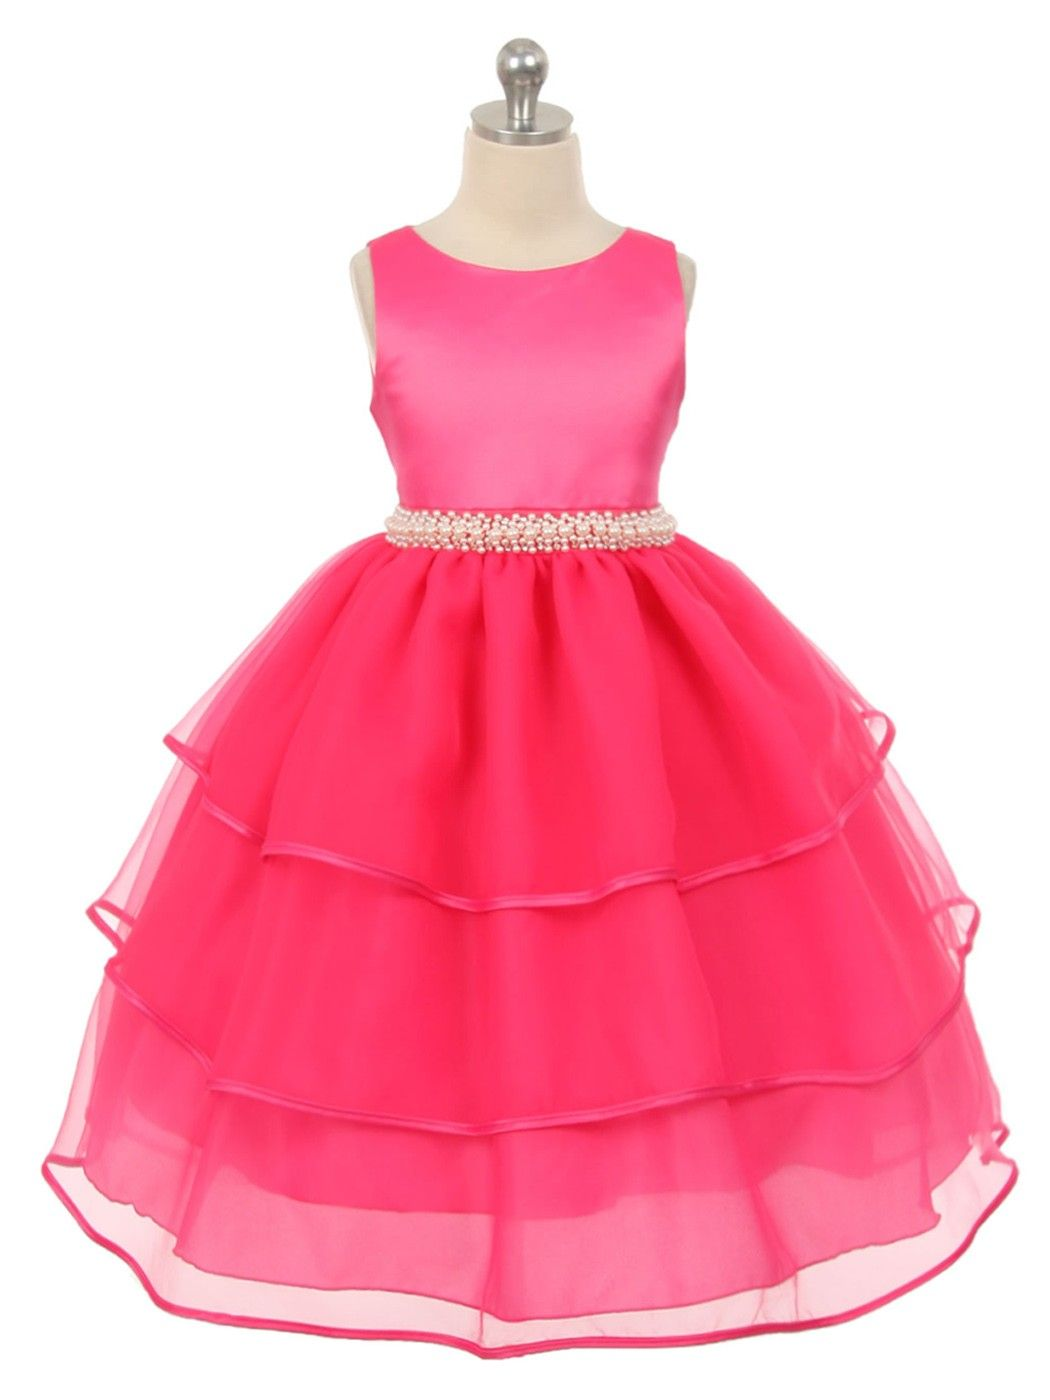 Fuschia colored flower girl dresses